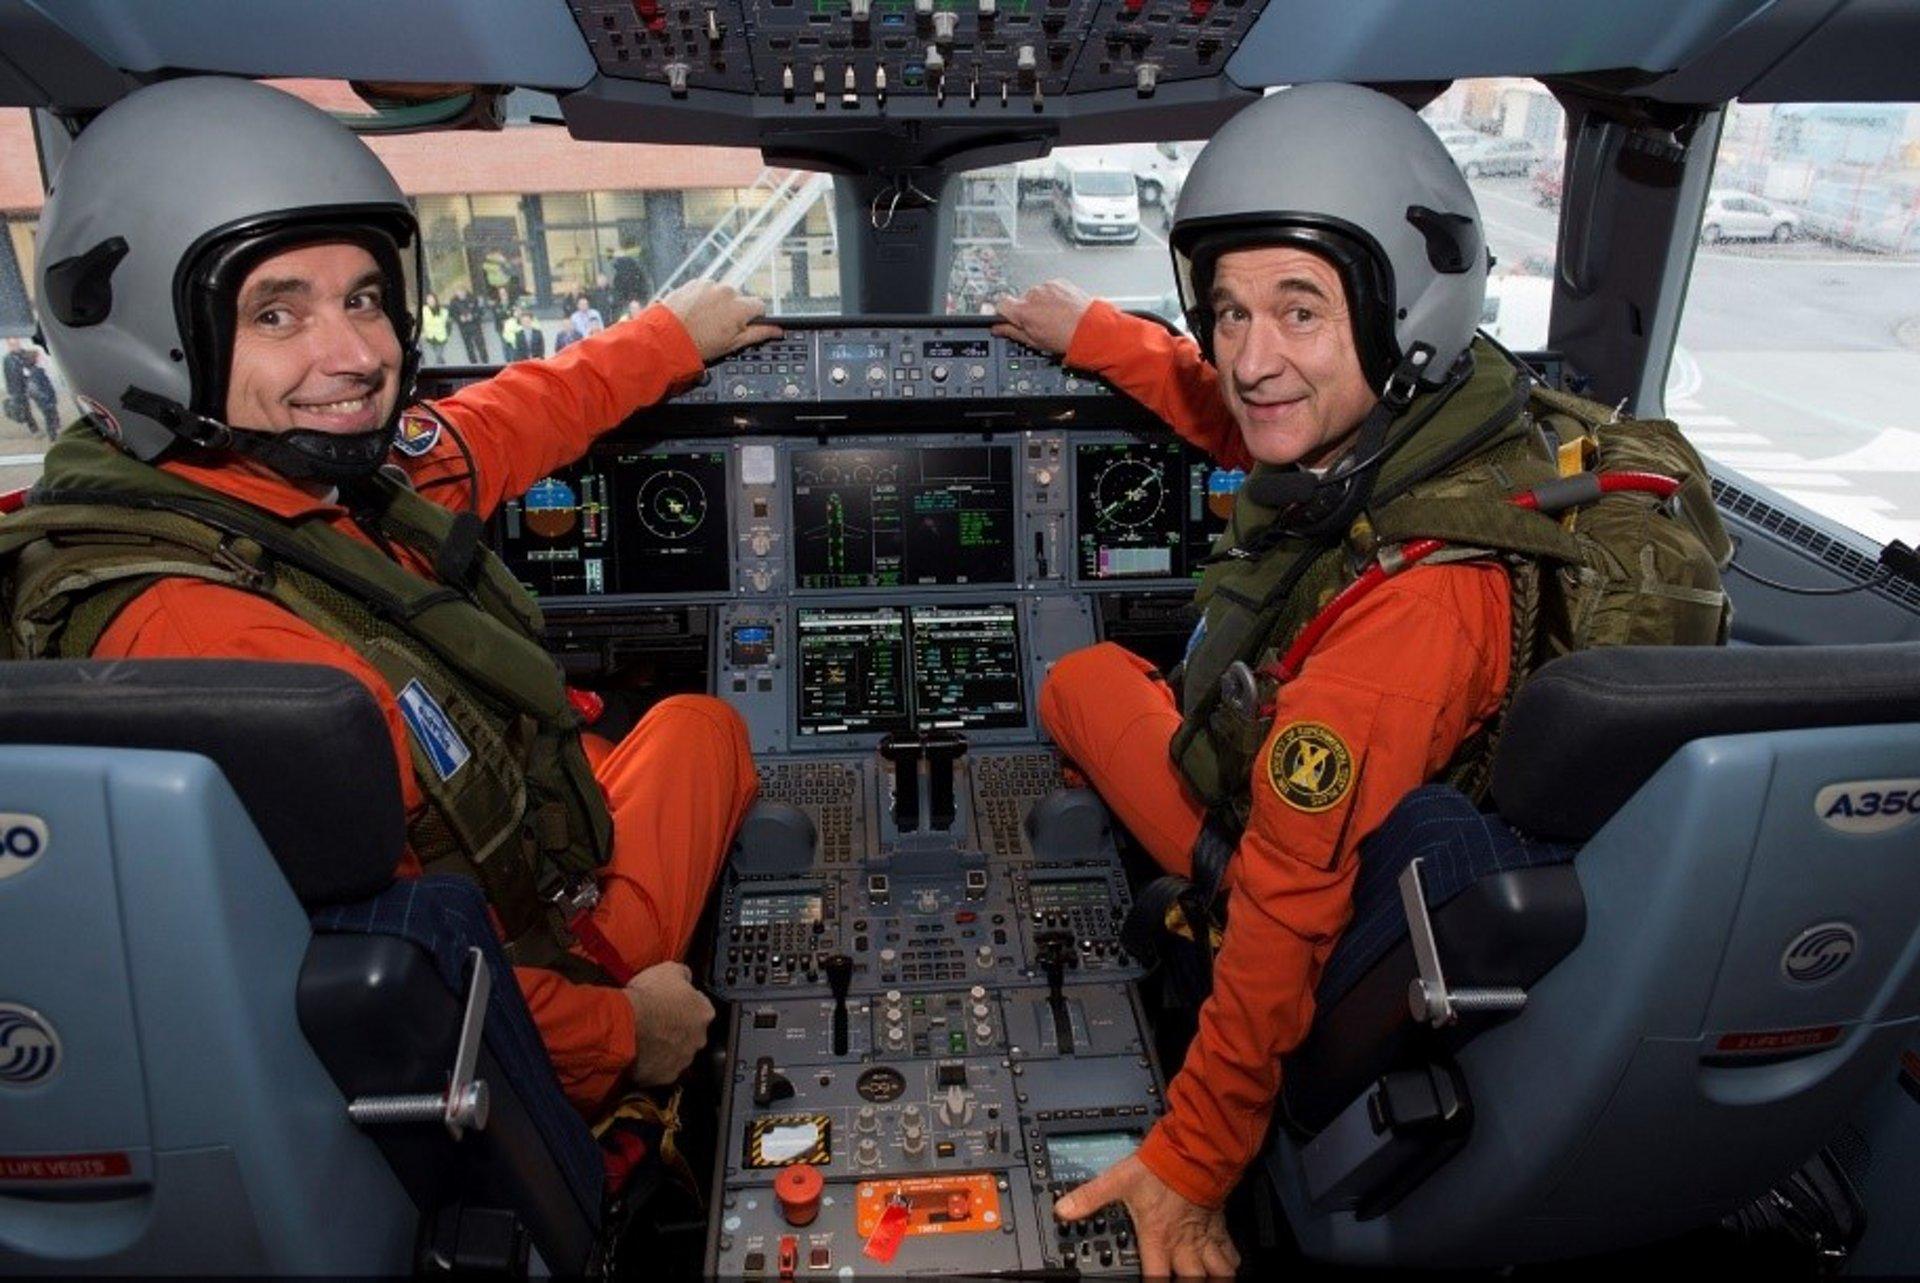 Airbus test pilot Frank Chapman 3